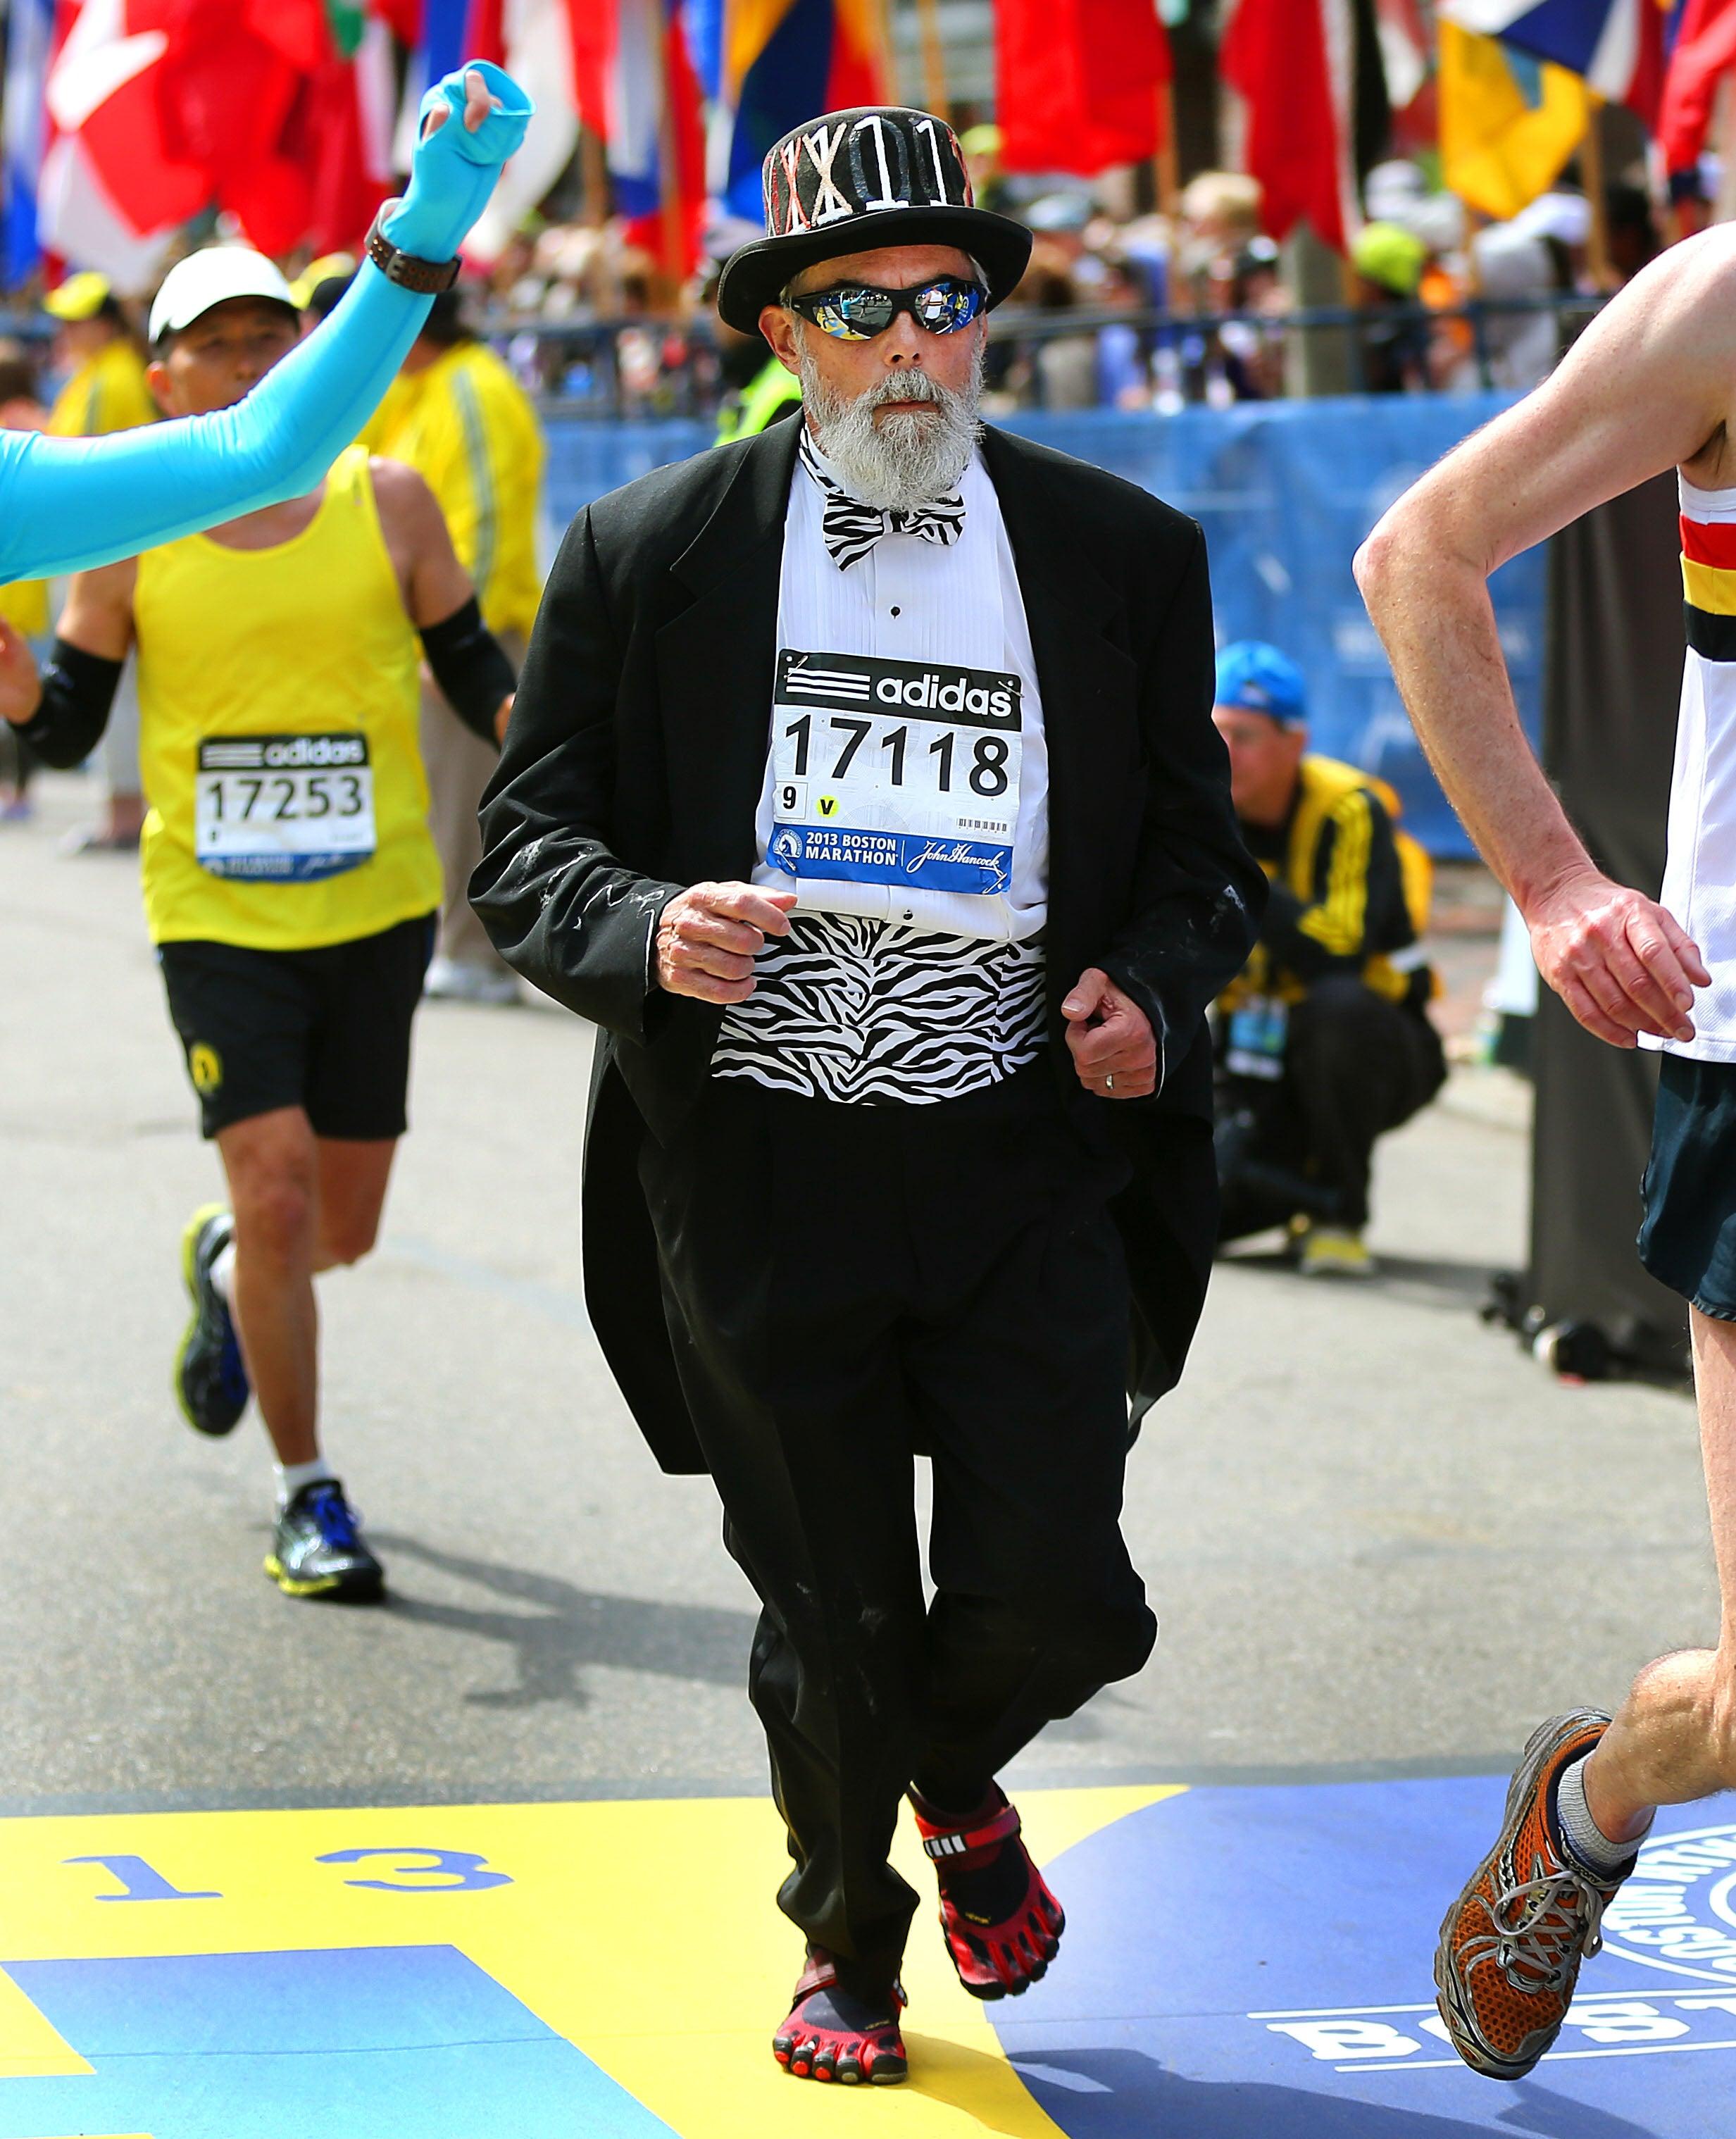 Boston Marathon 2013 Costumed Runners